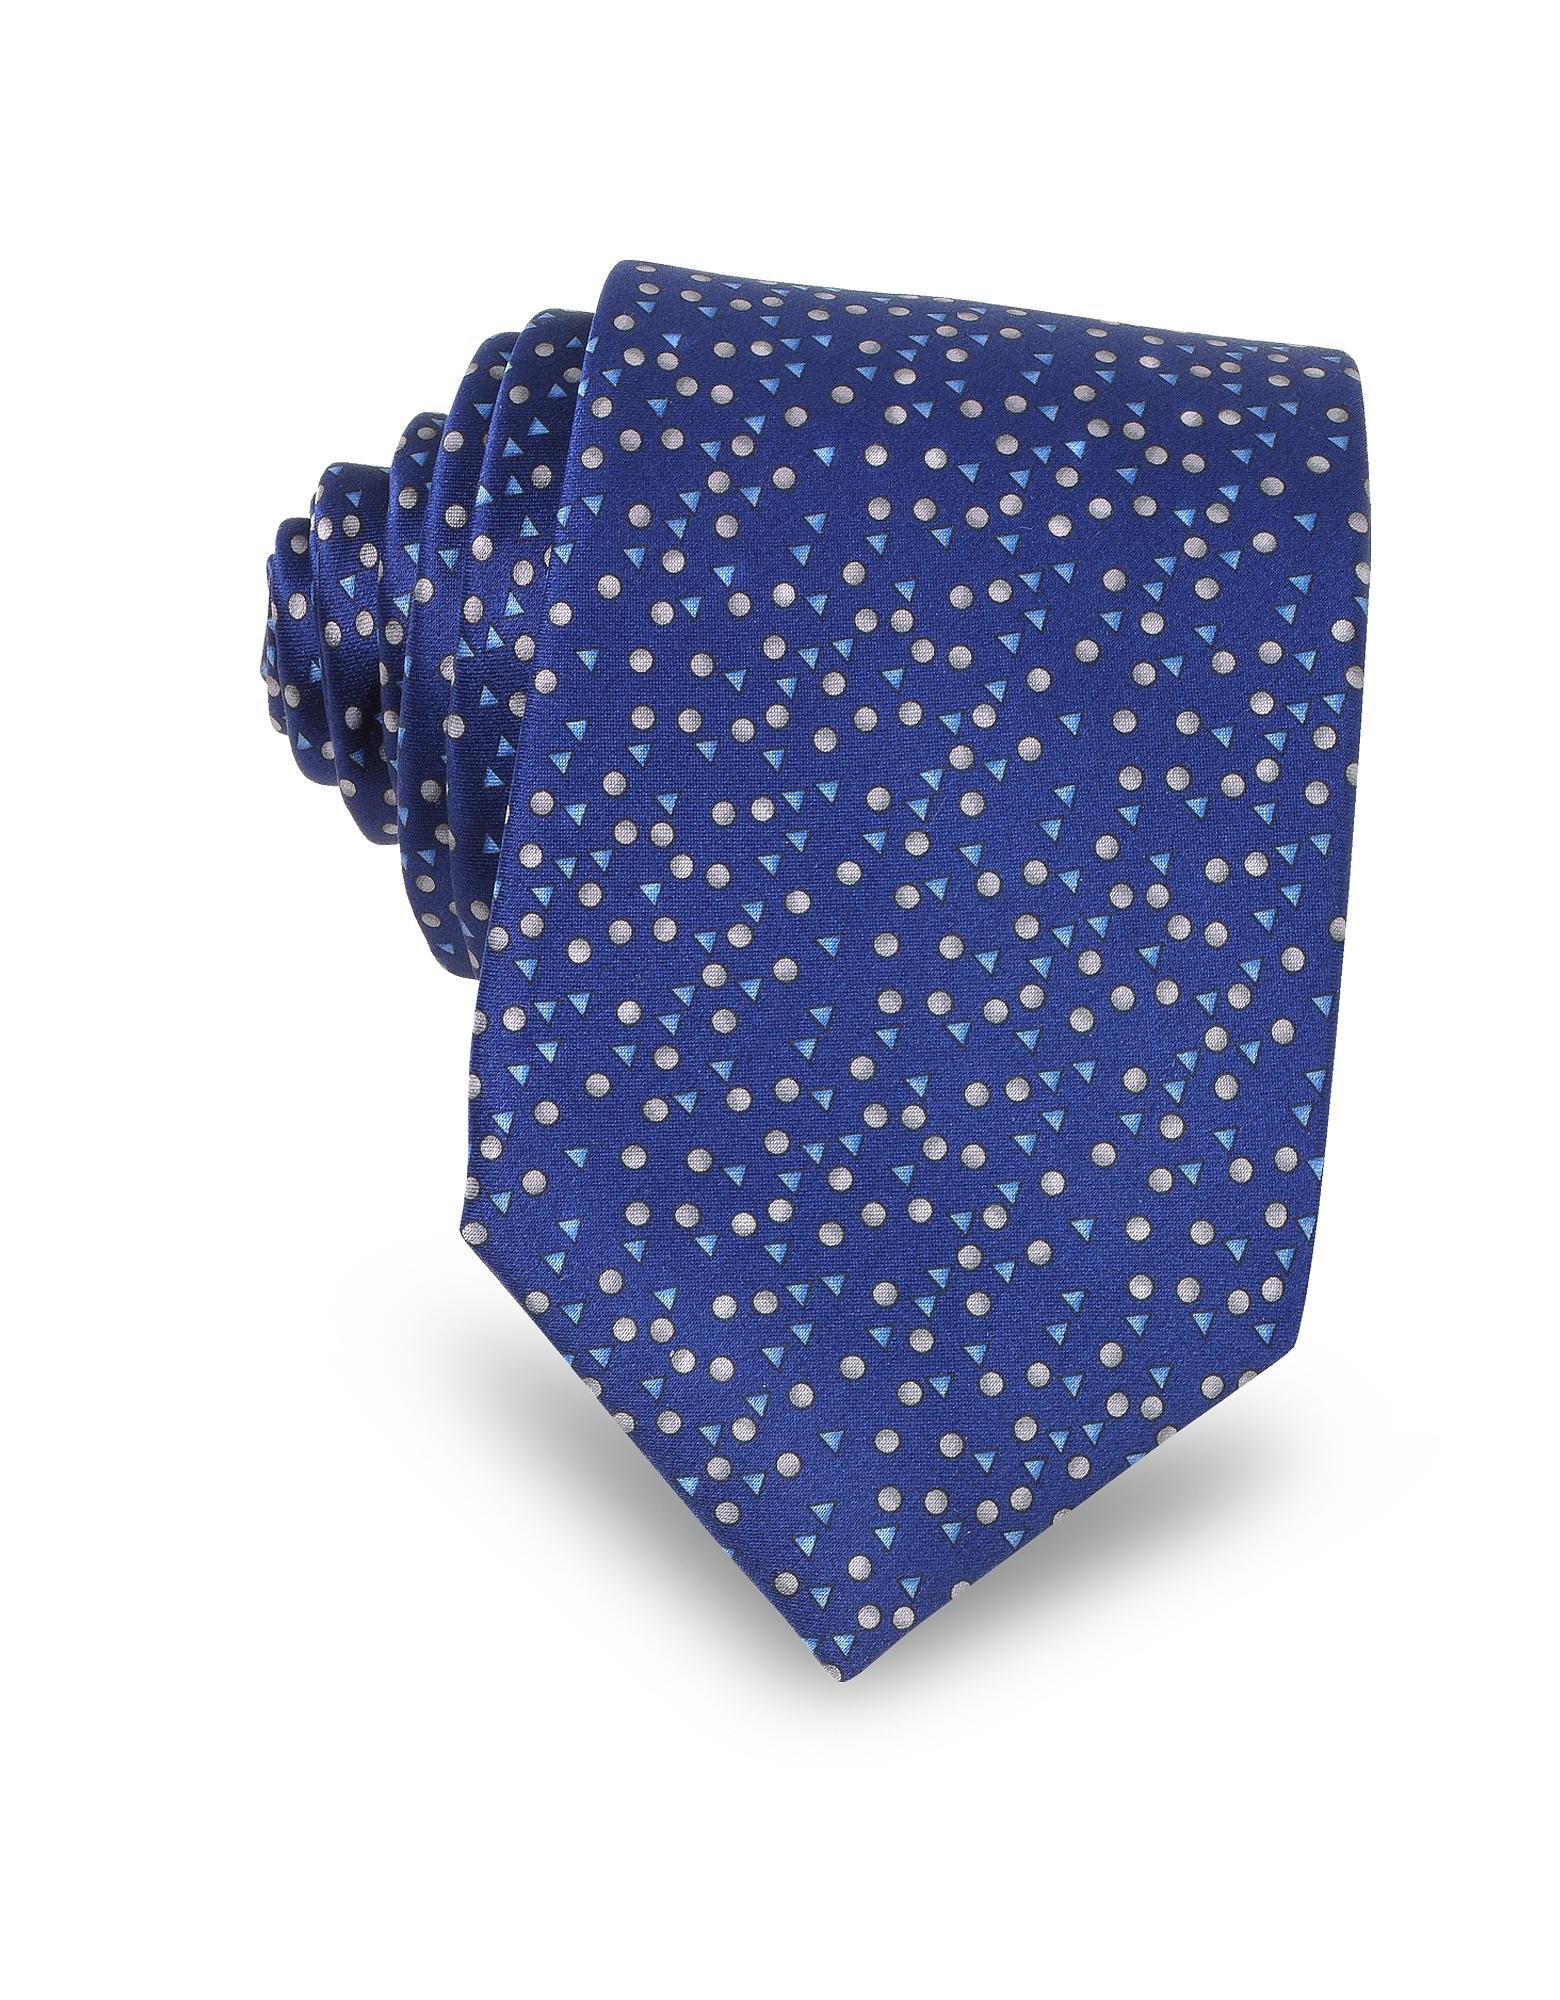 Cobalt Blue Geometric Print Silk Men's Narrow Tie